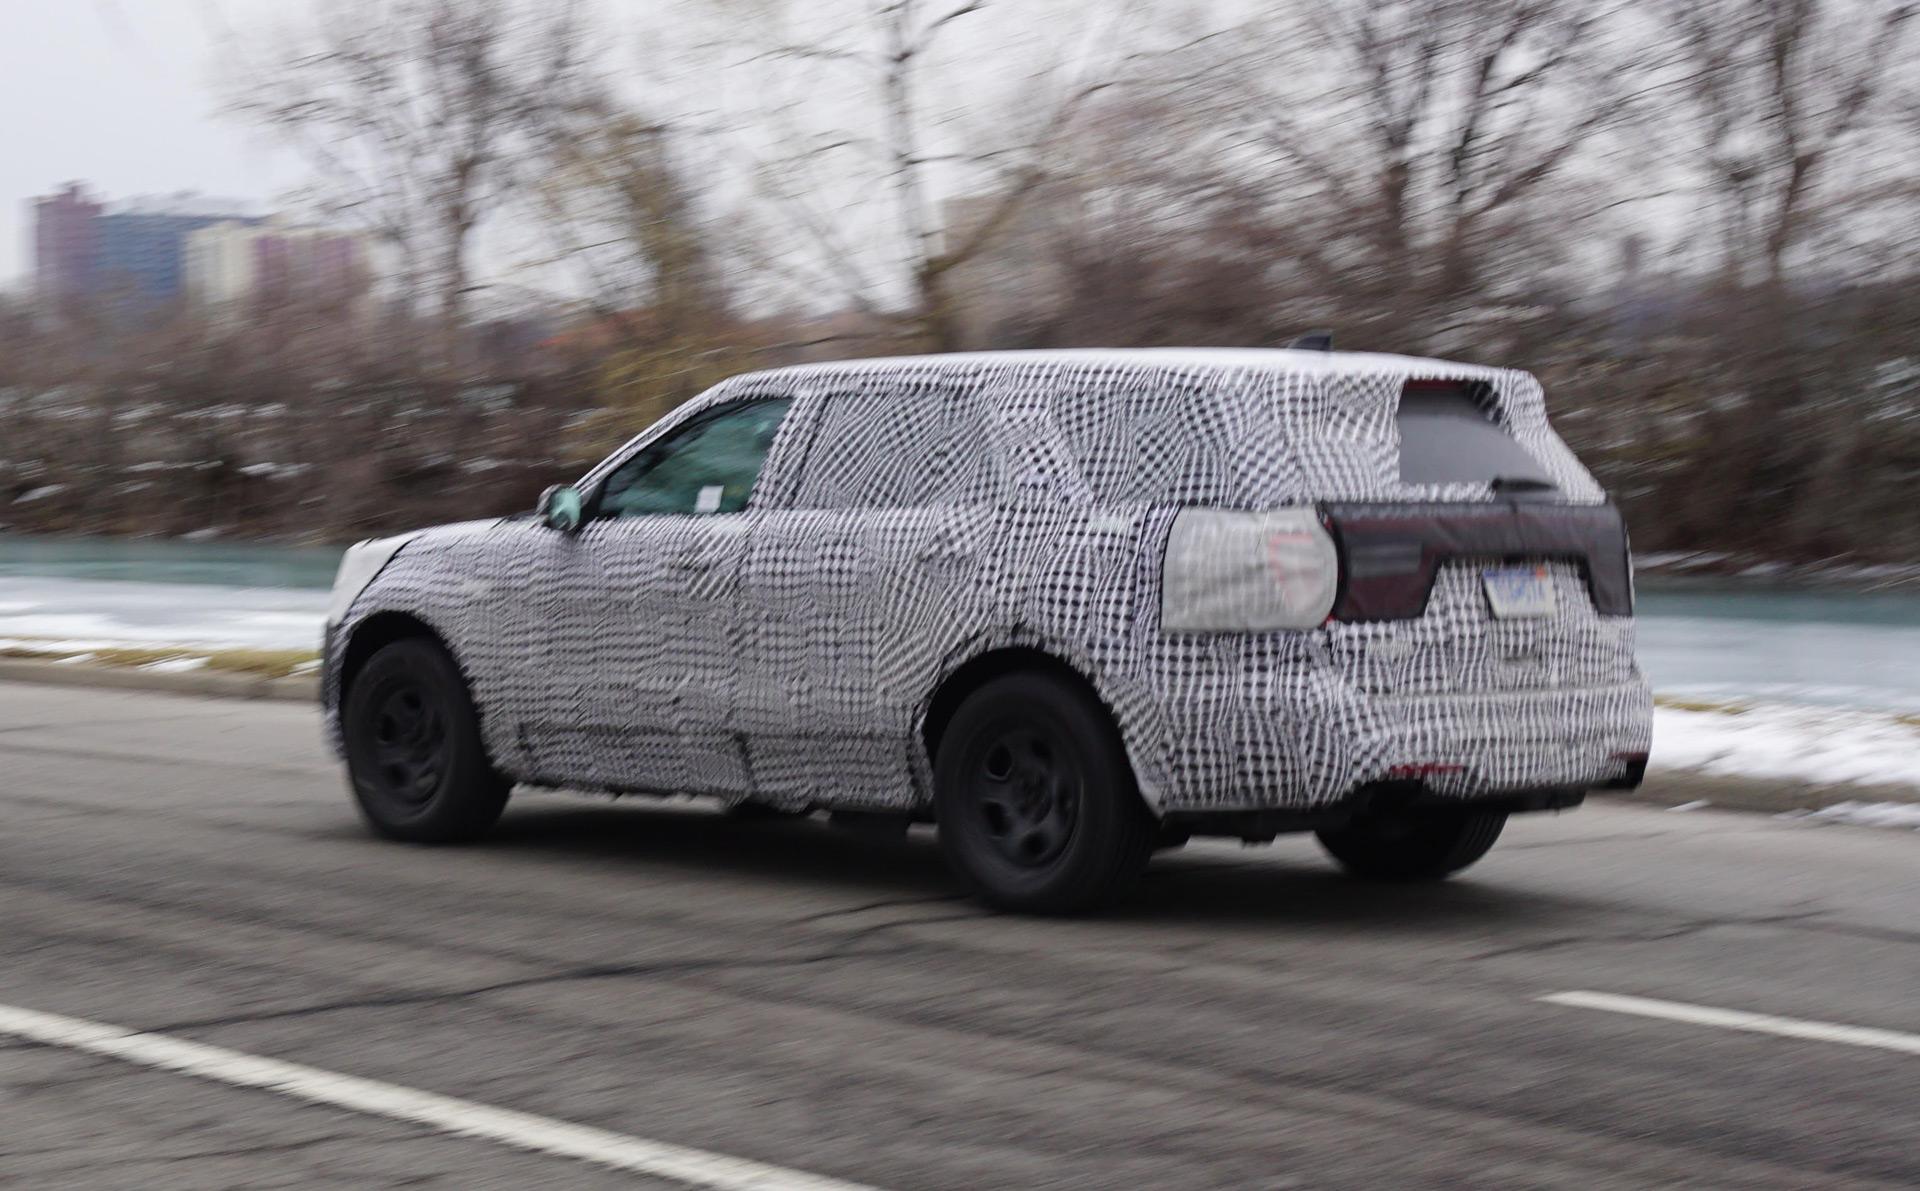 2019 Ford Explorer, Dodge Demon, Polestar's Future: The ...